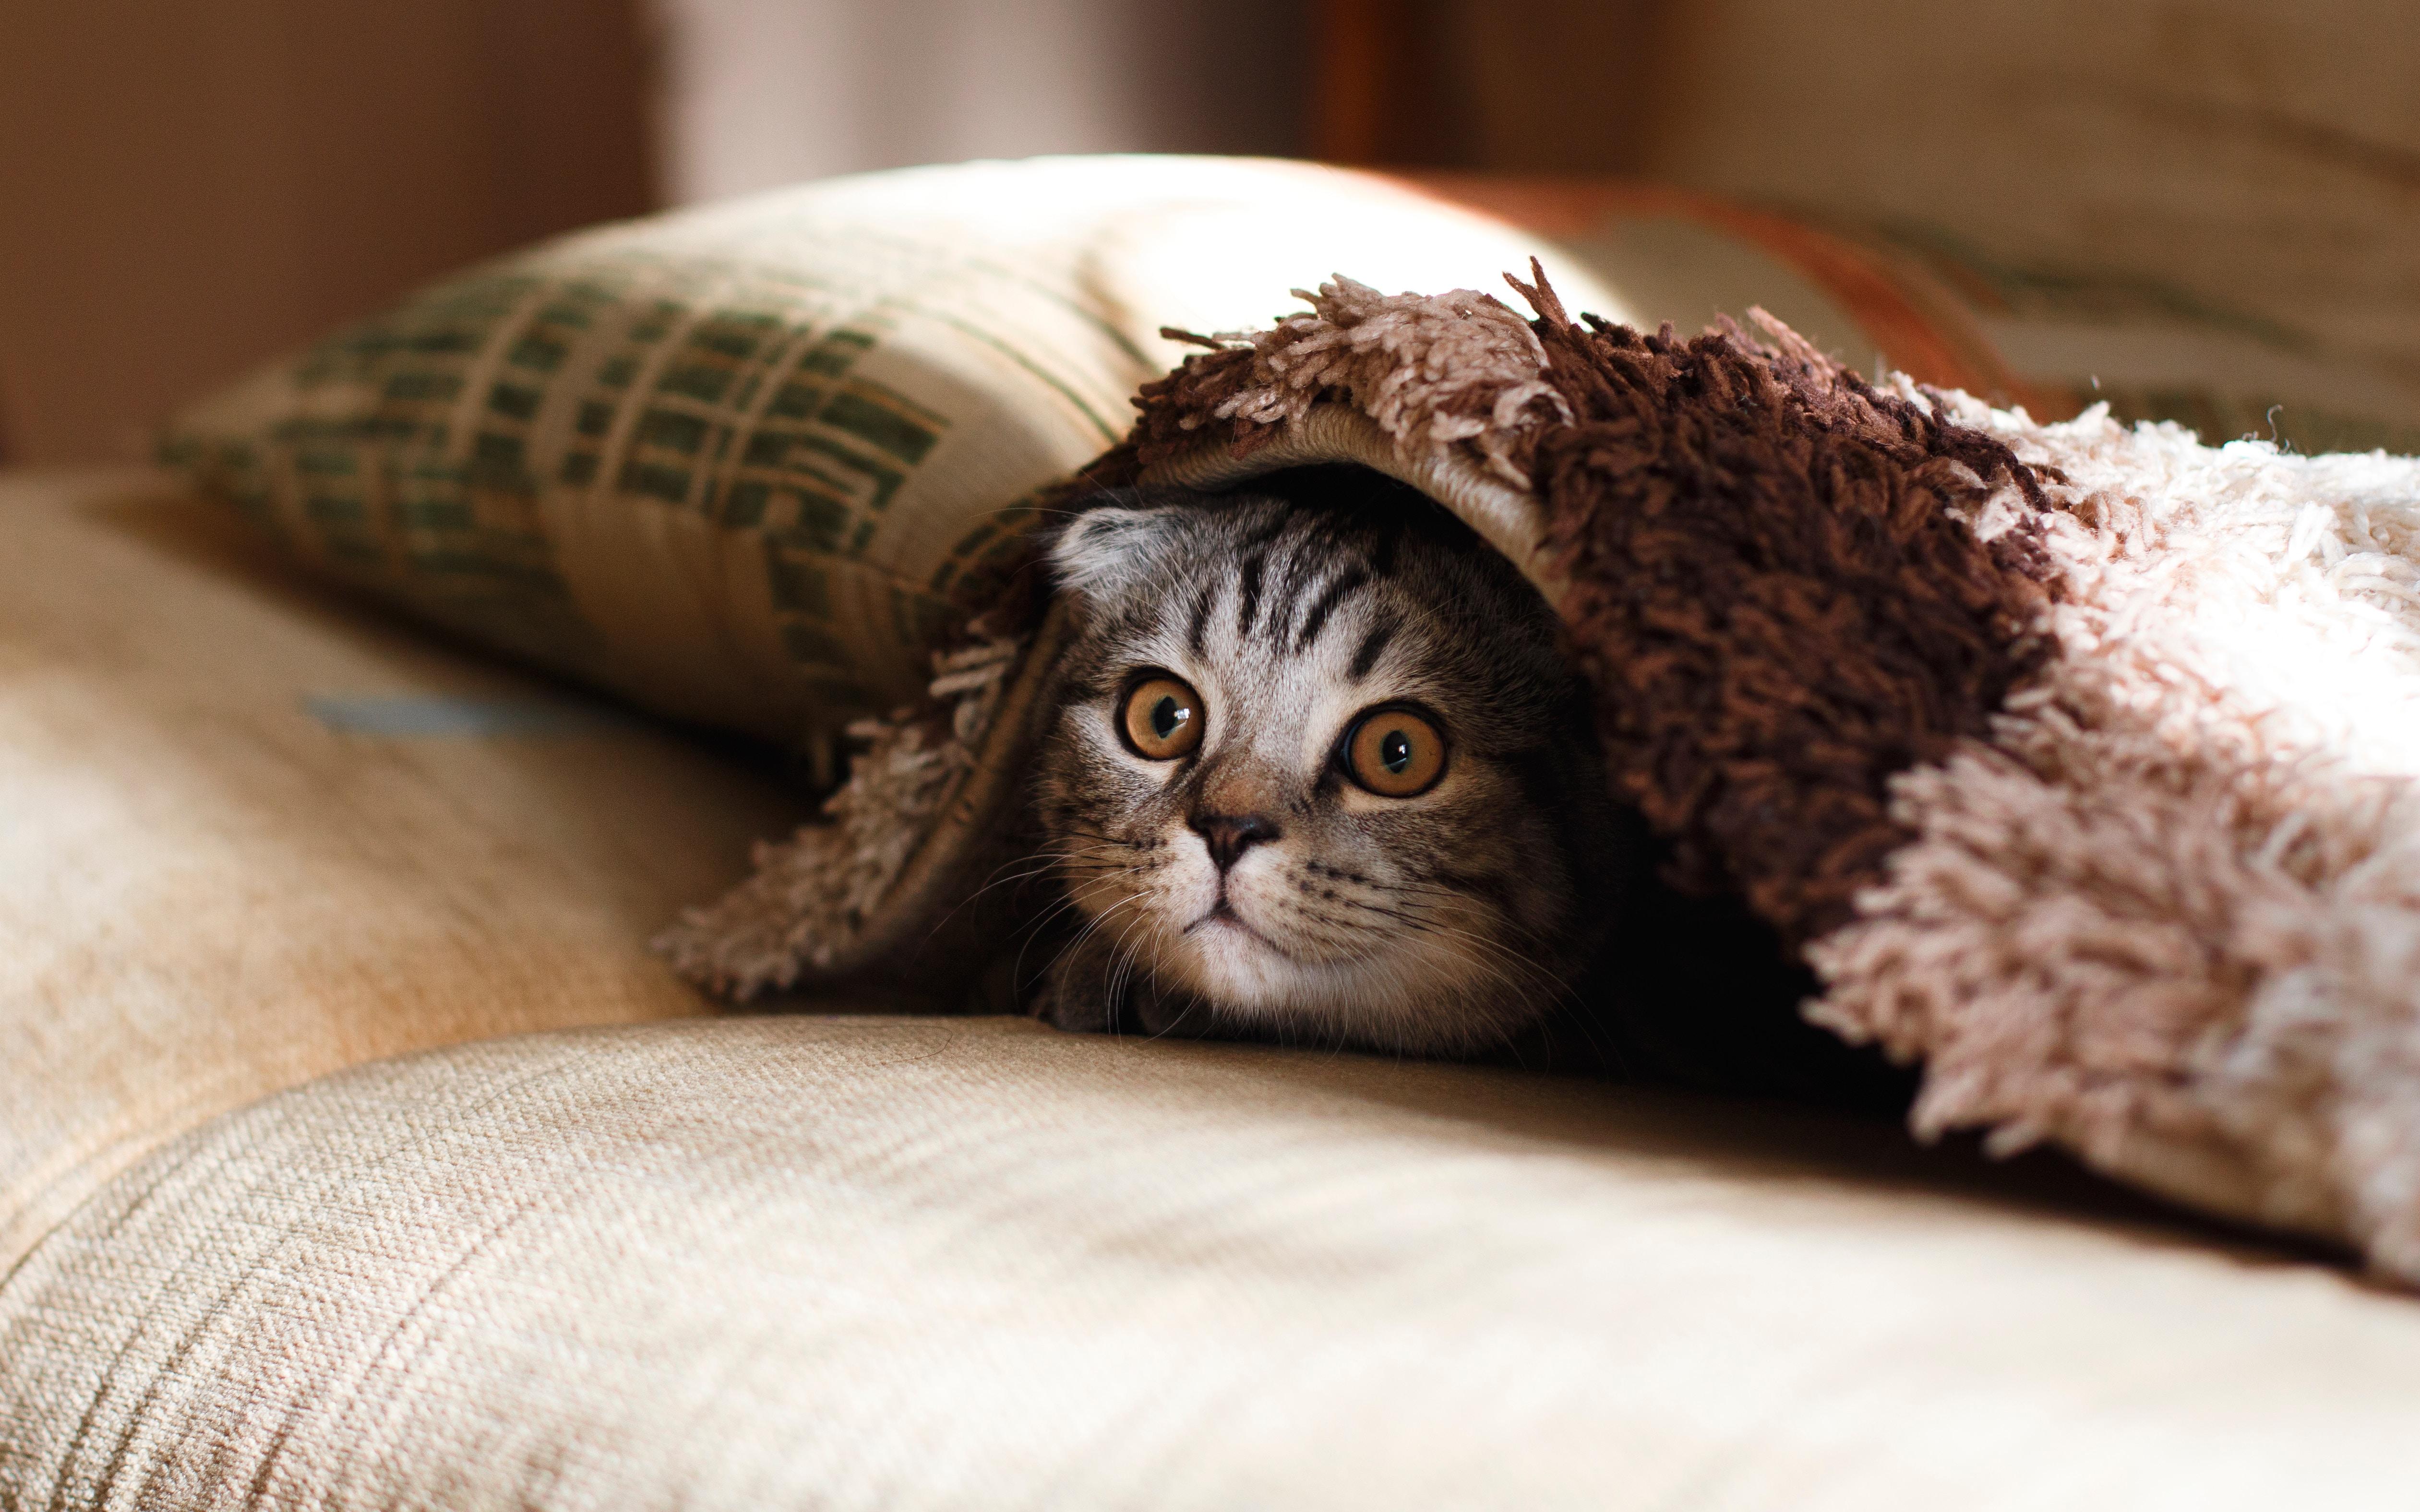 cat vaccination, how to destress a cat, langwarrin vet clinic, vet clinic mornington peninsula, frankston vet, seaford vet, stress relief for cats, nervous cat, scared kitten, calming cat, cats anxiety